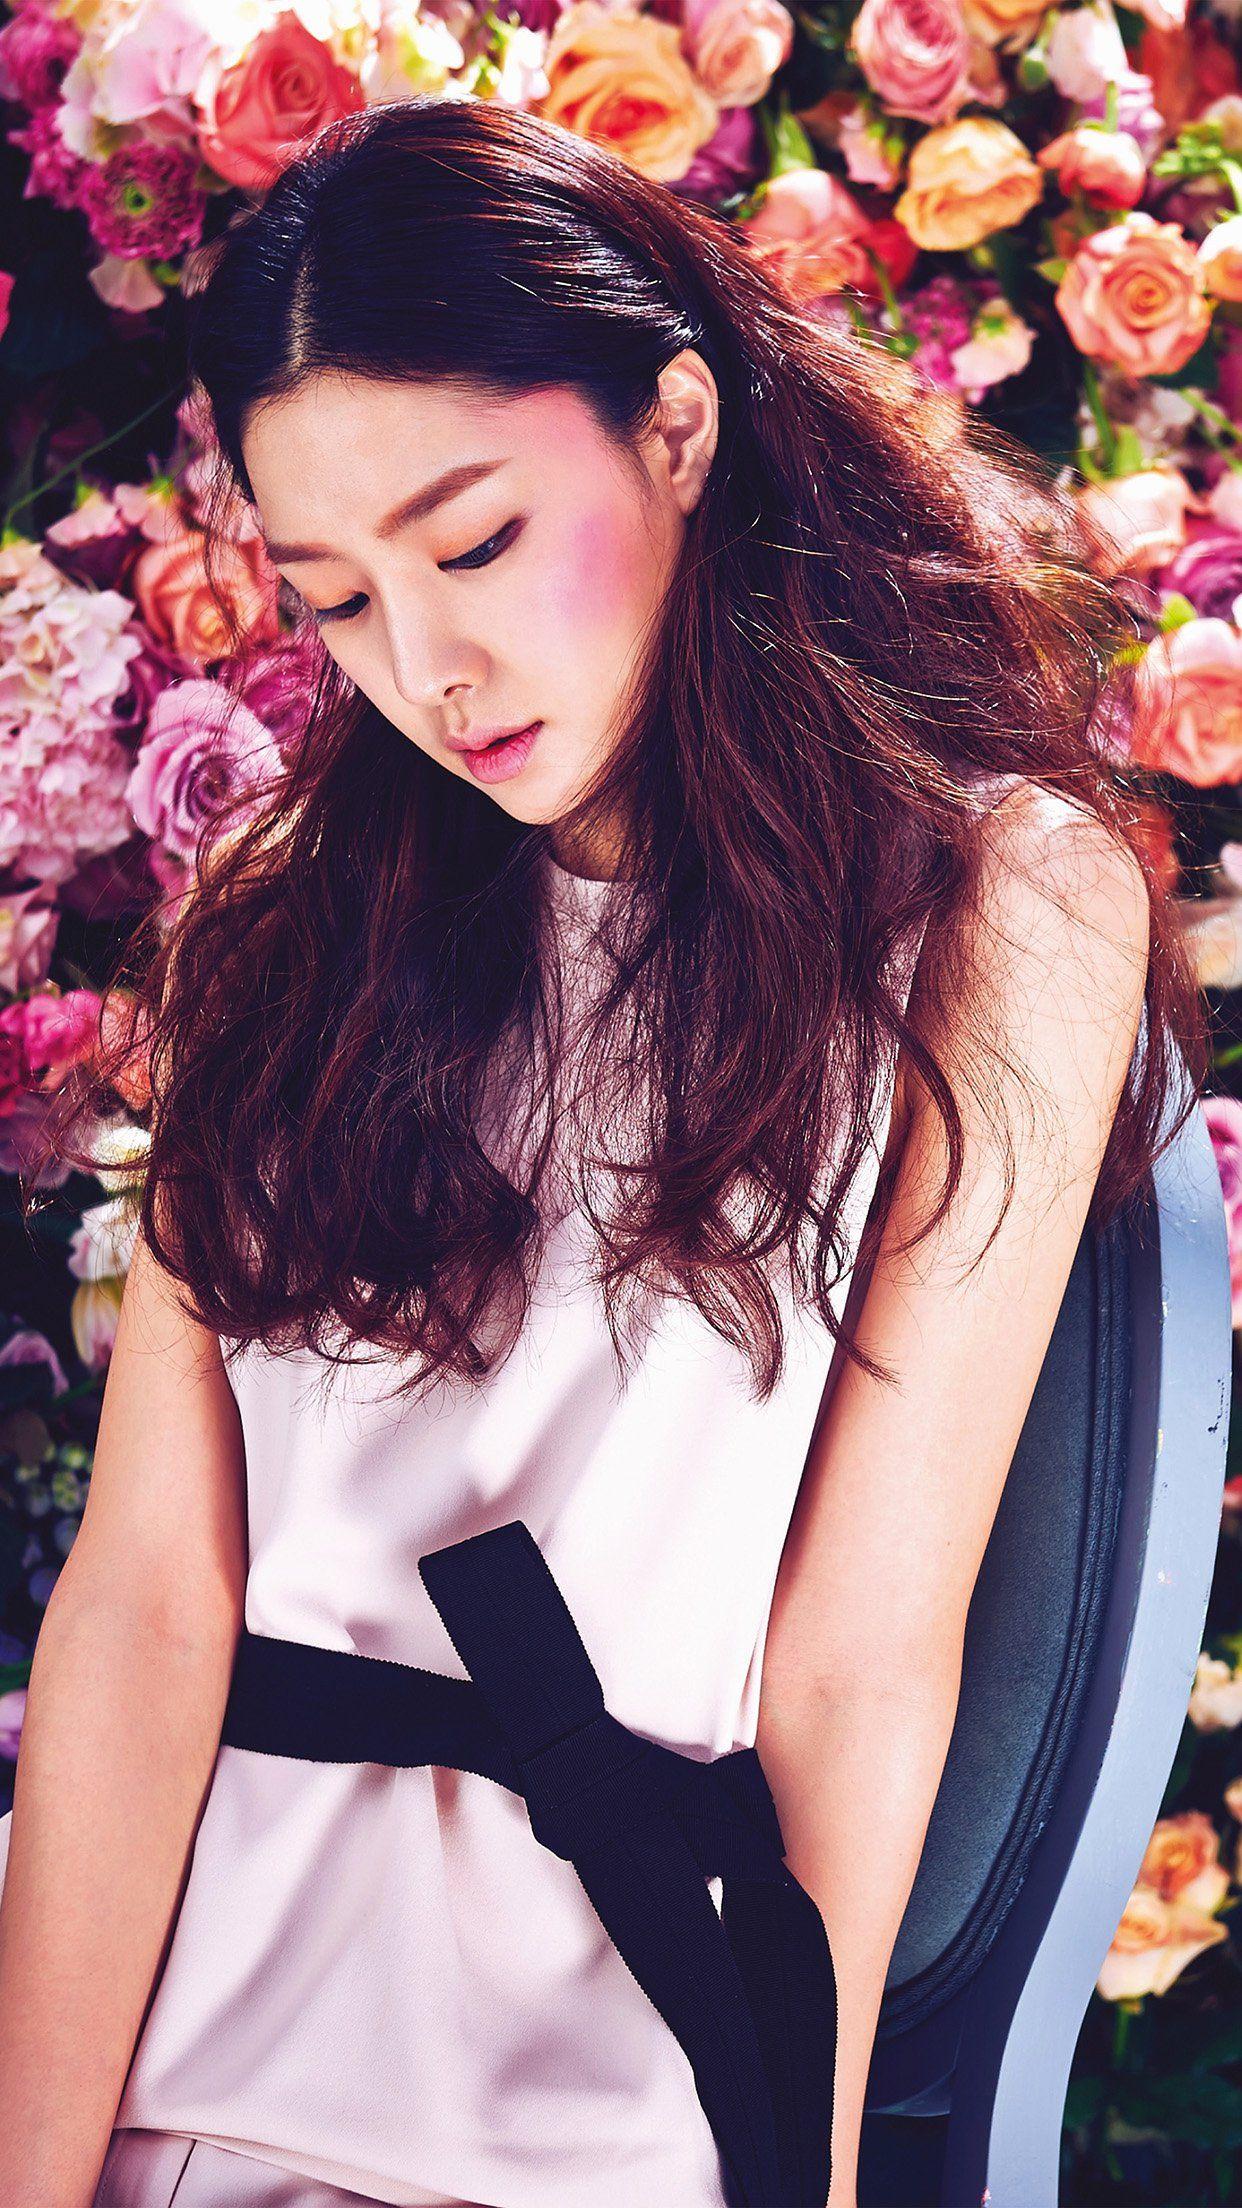 Spring Kpop Flower Art Model iPhone 6 plus wallpaper